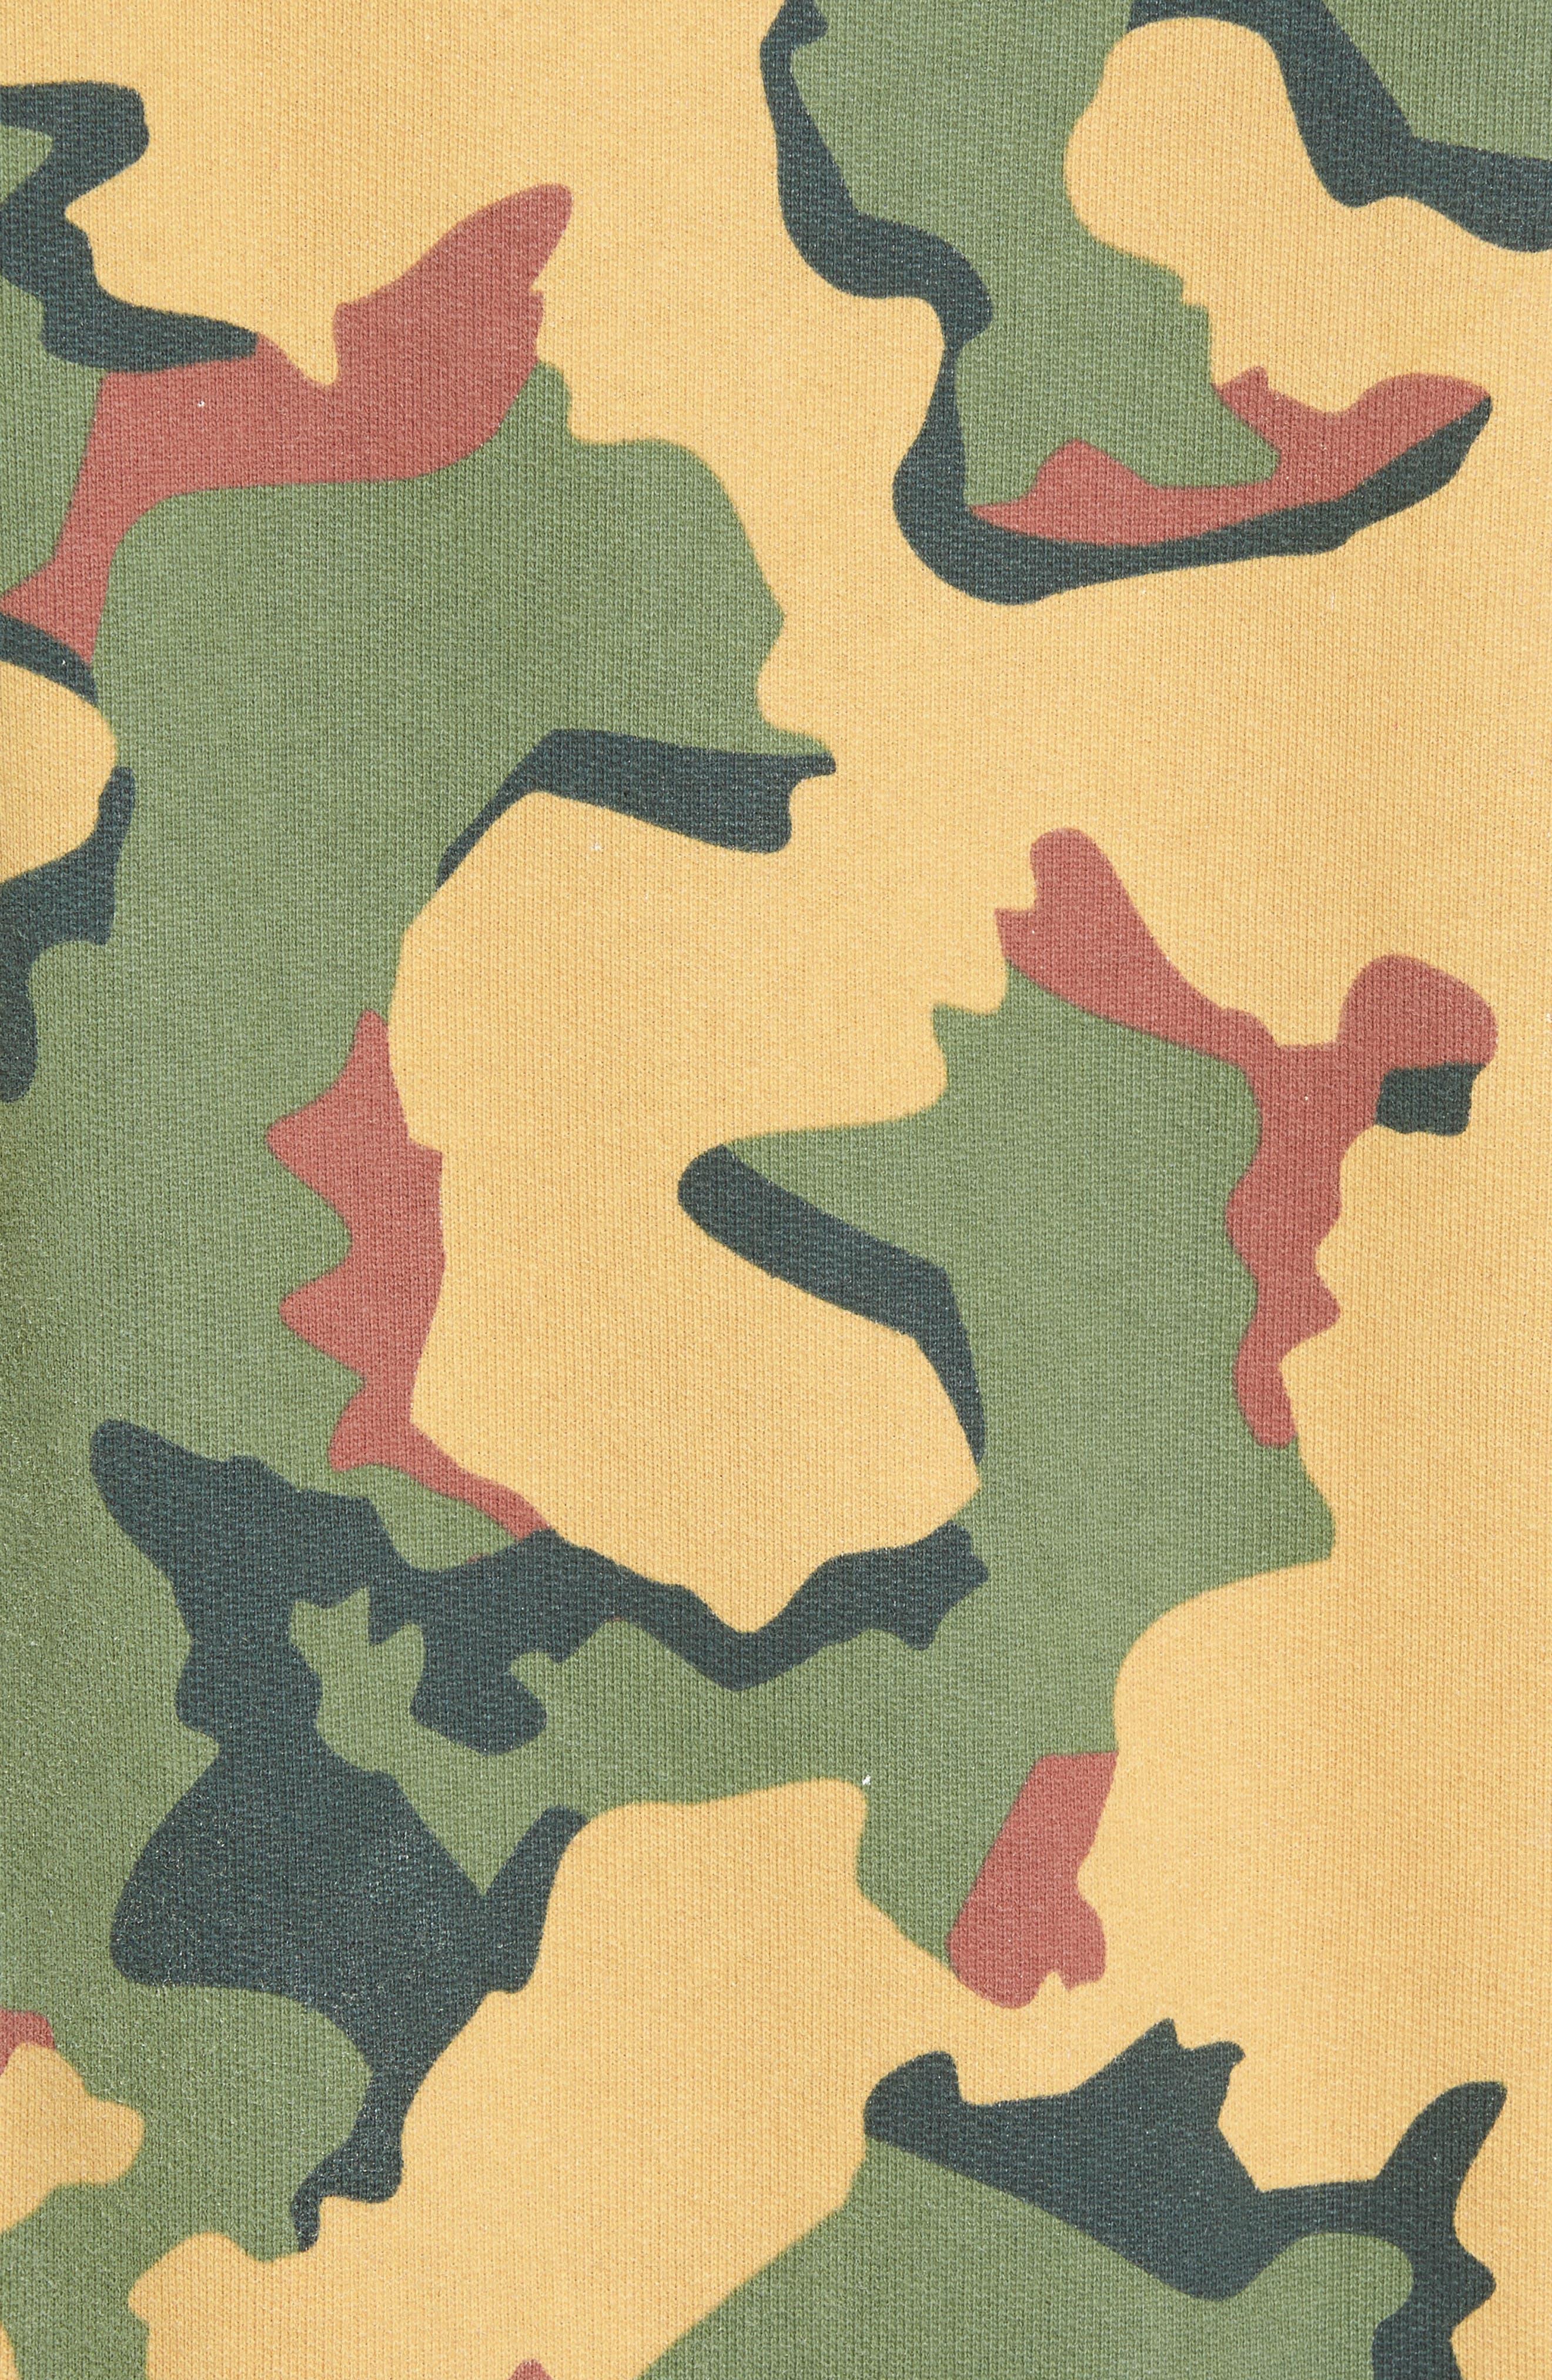 Anatole Camo Fleece Sweatshirt,                             Alternate thumbnail 5, color,                             Big Camo Print